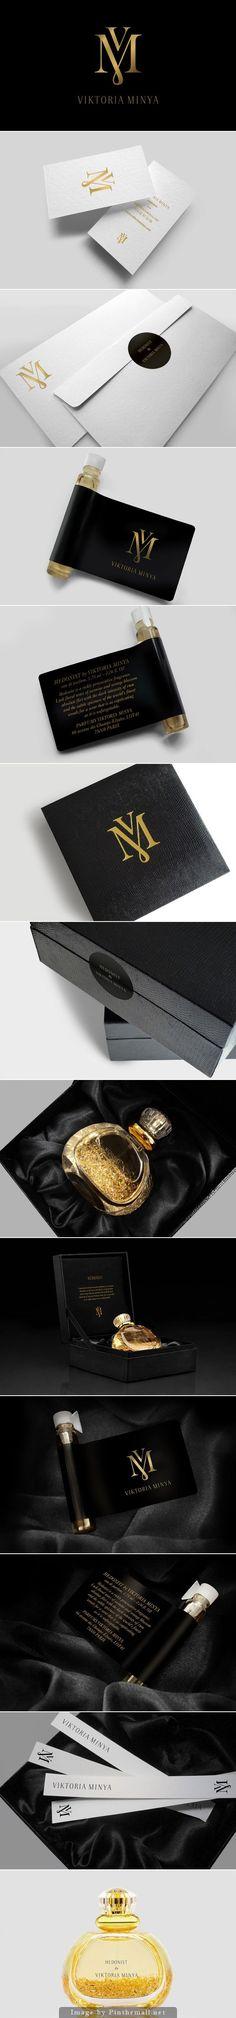 Viktoria Minya Perfume Branding #victoria #viktoria #minya #perfume #branding…